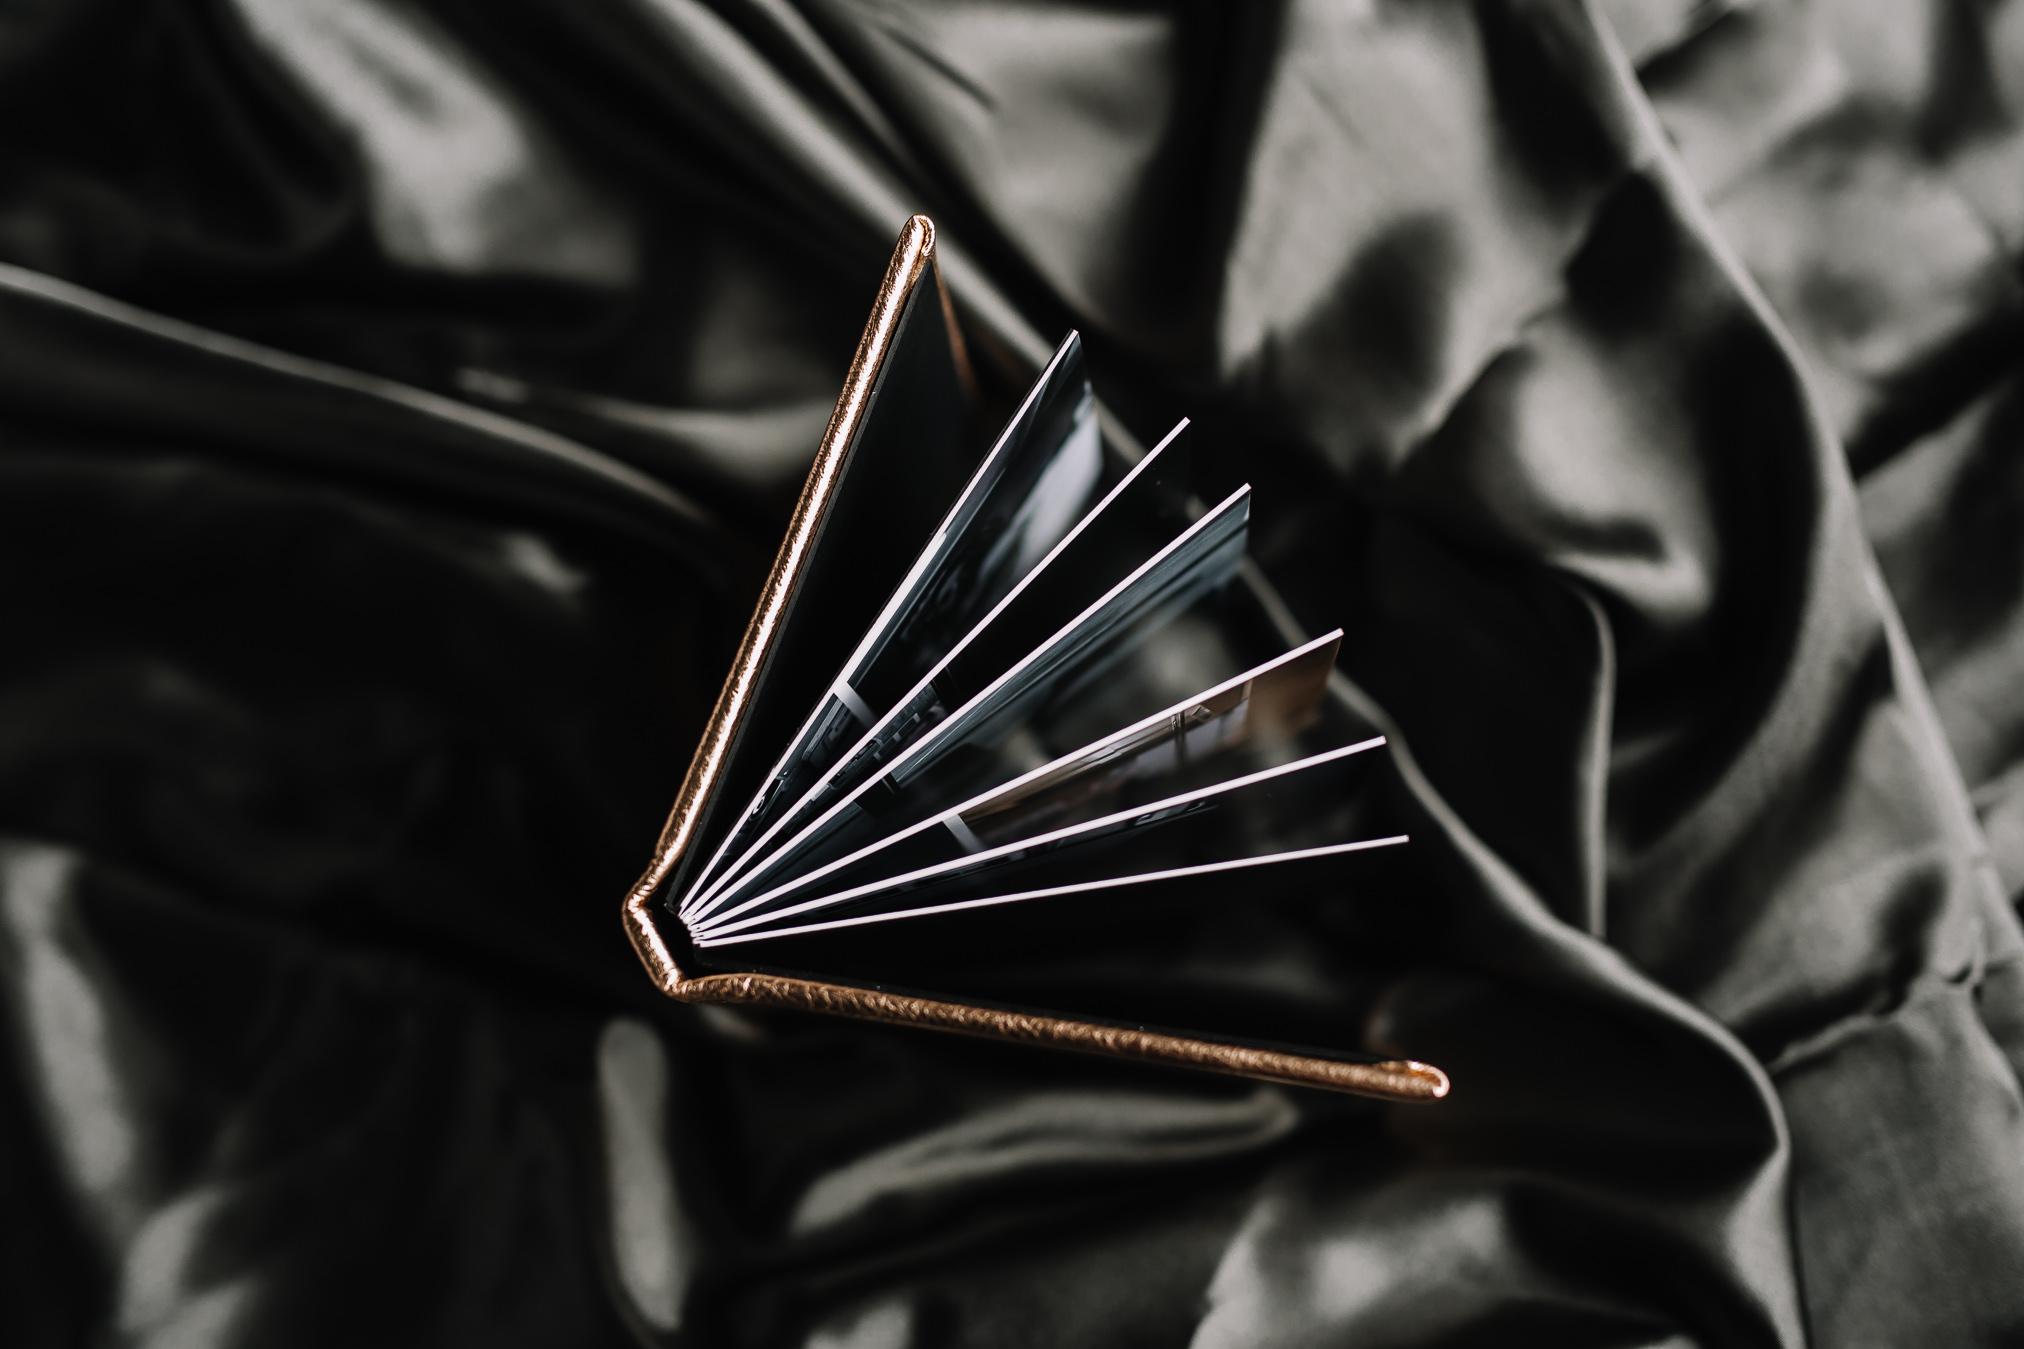 PRINTS ALBUM PACKAGING BOUDOIR BY LEXY CEDAR FALLS IOWA-4.jpg